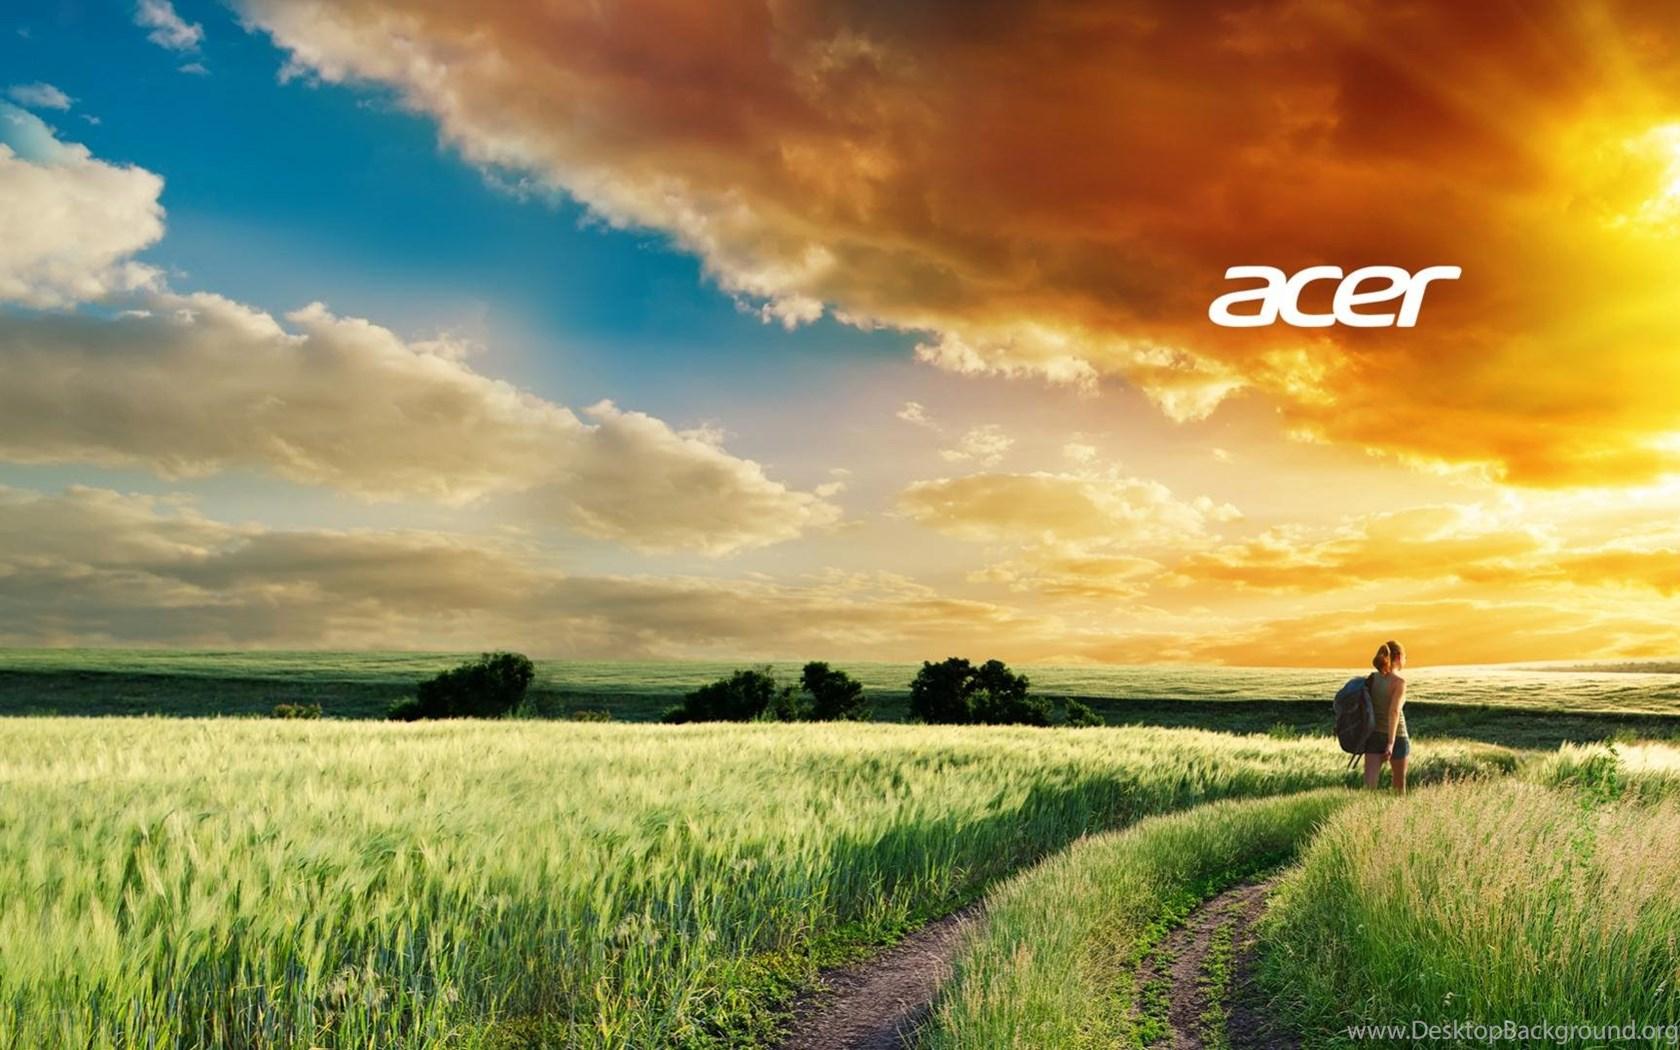 Hd Desktop Backgrounds 1680x1050: Acer HD Wallpapers Desktop Background